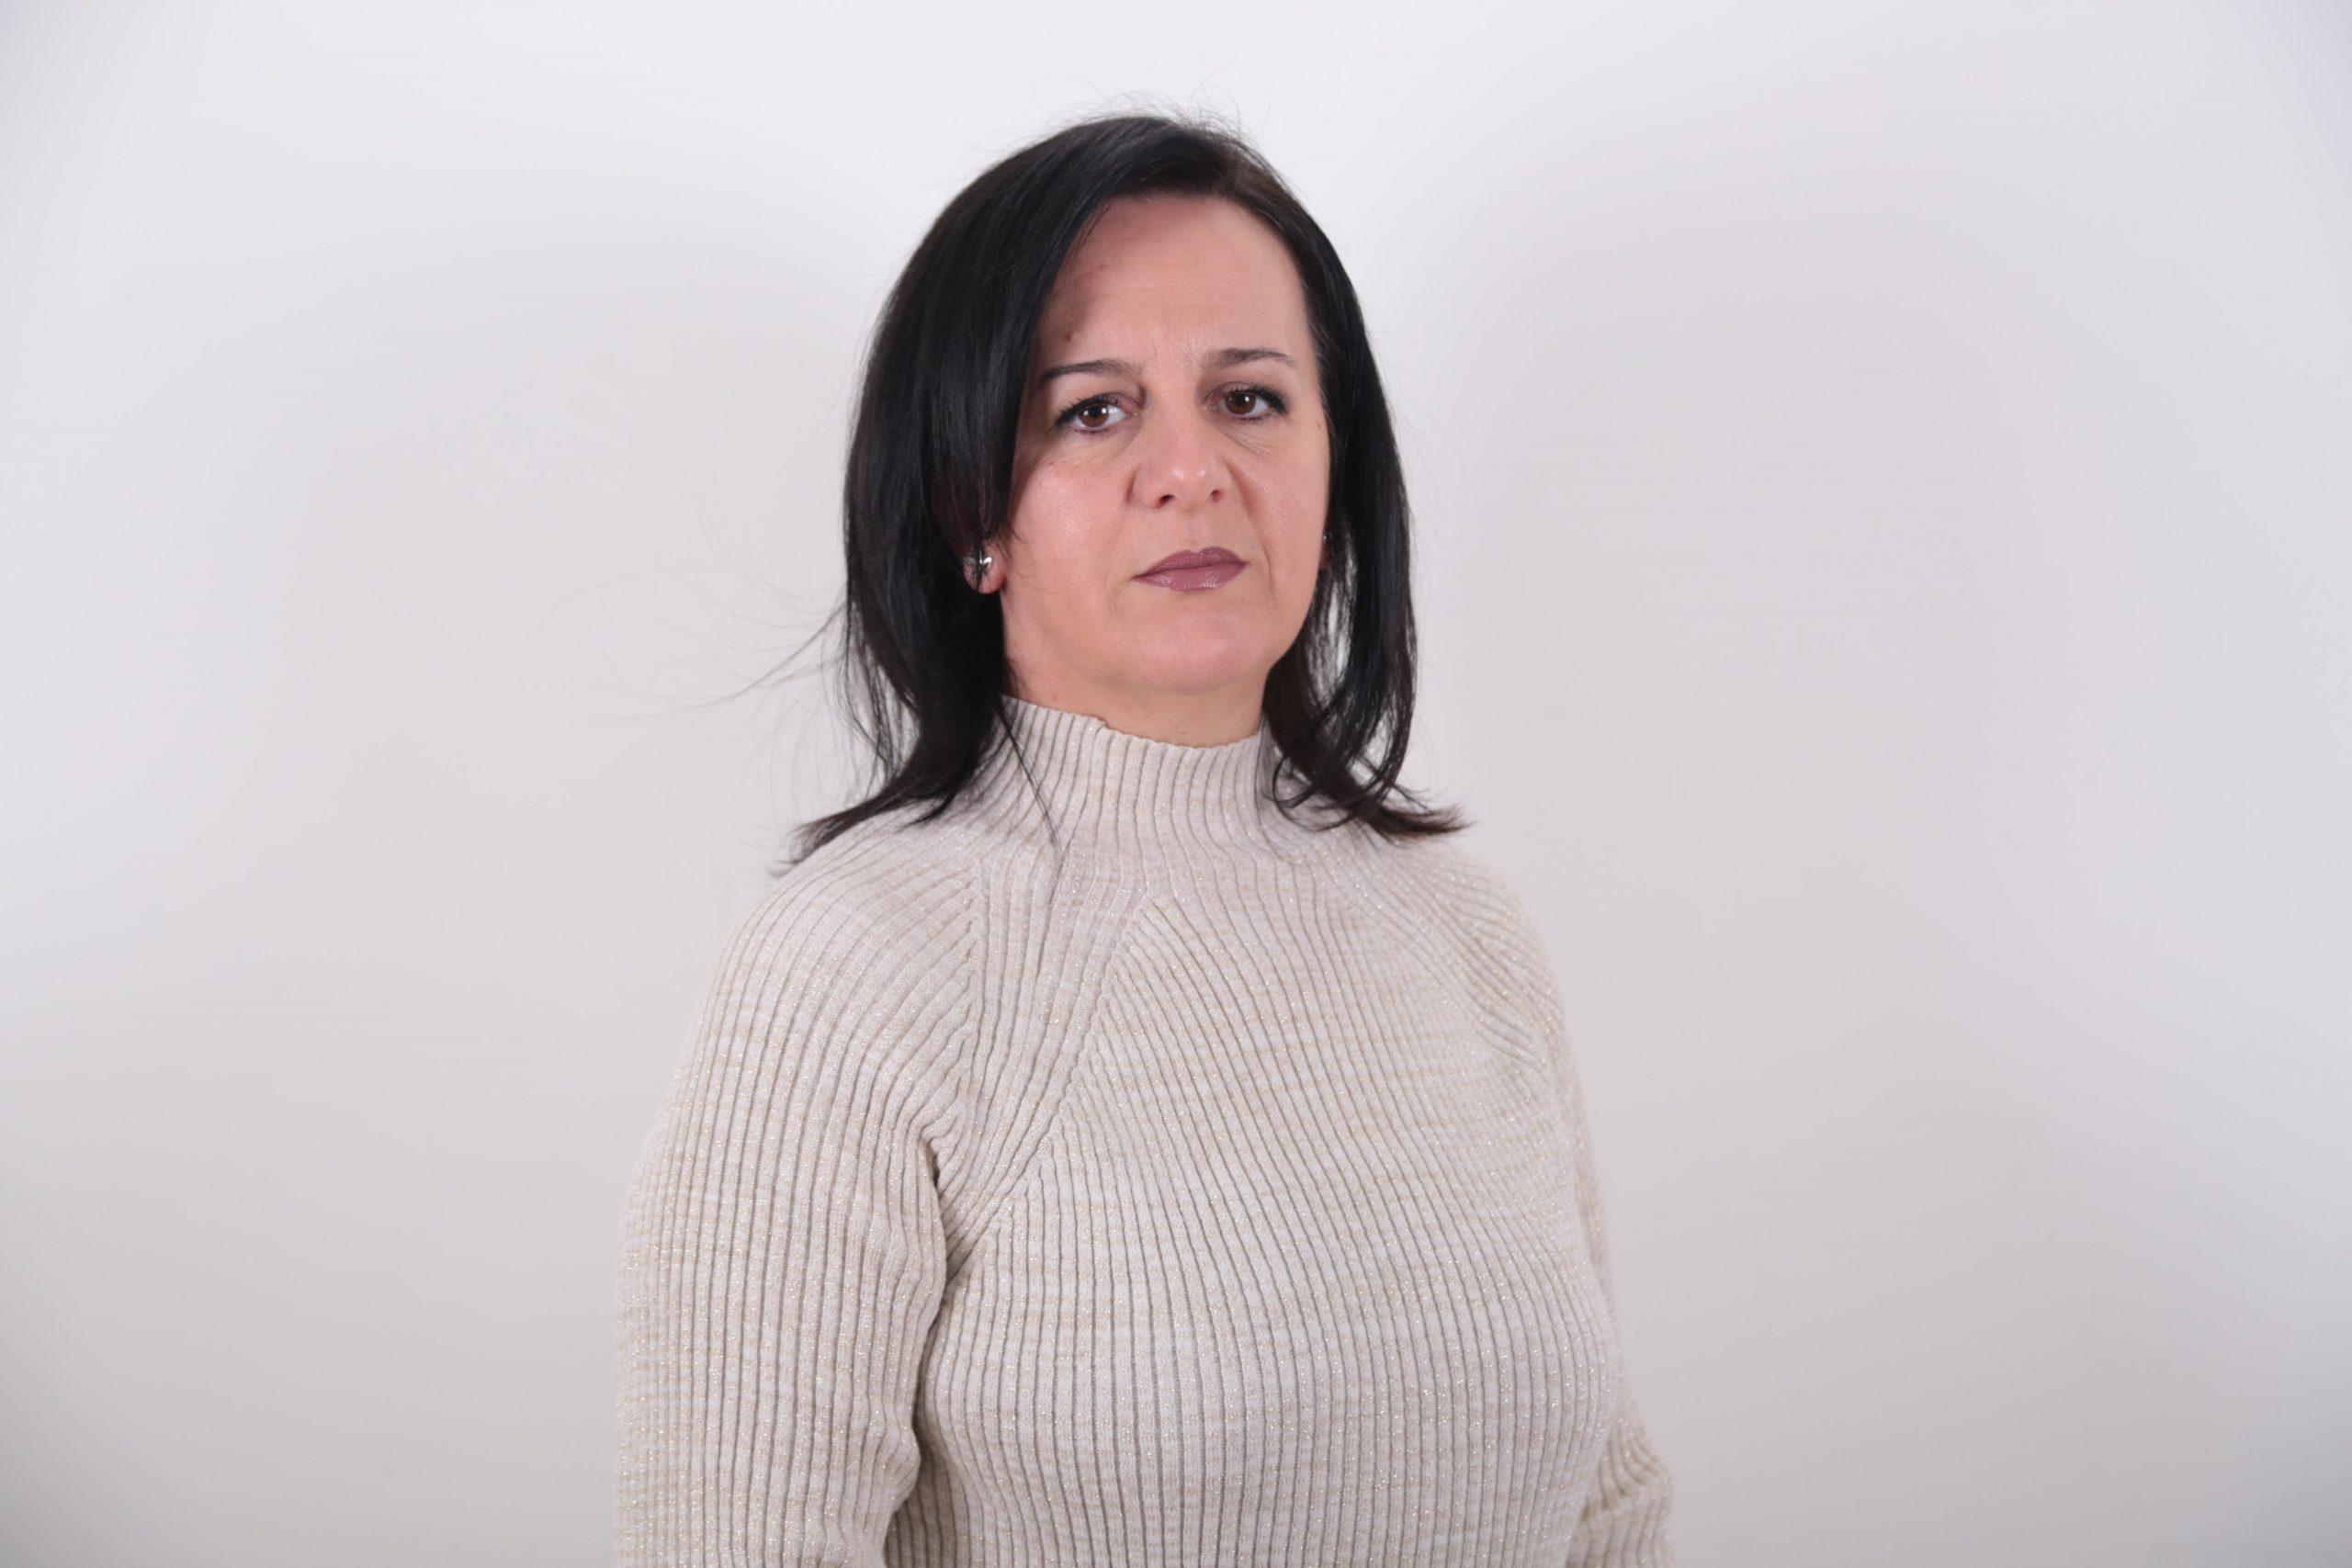 Arianeta Nura